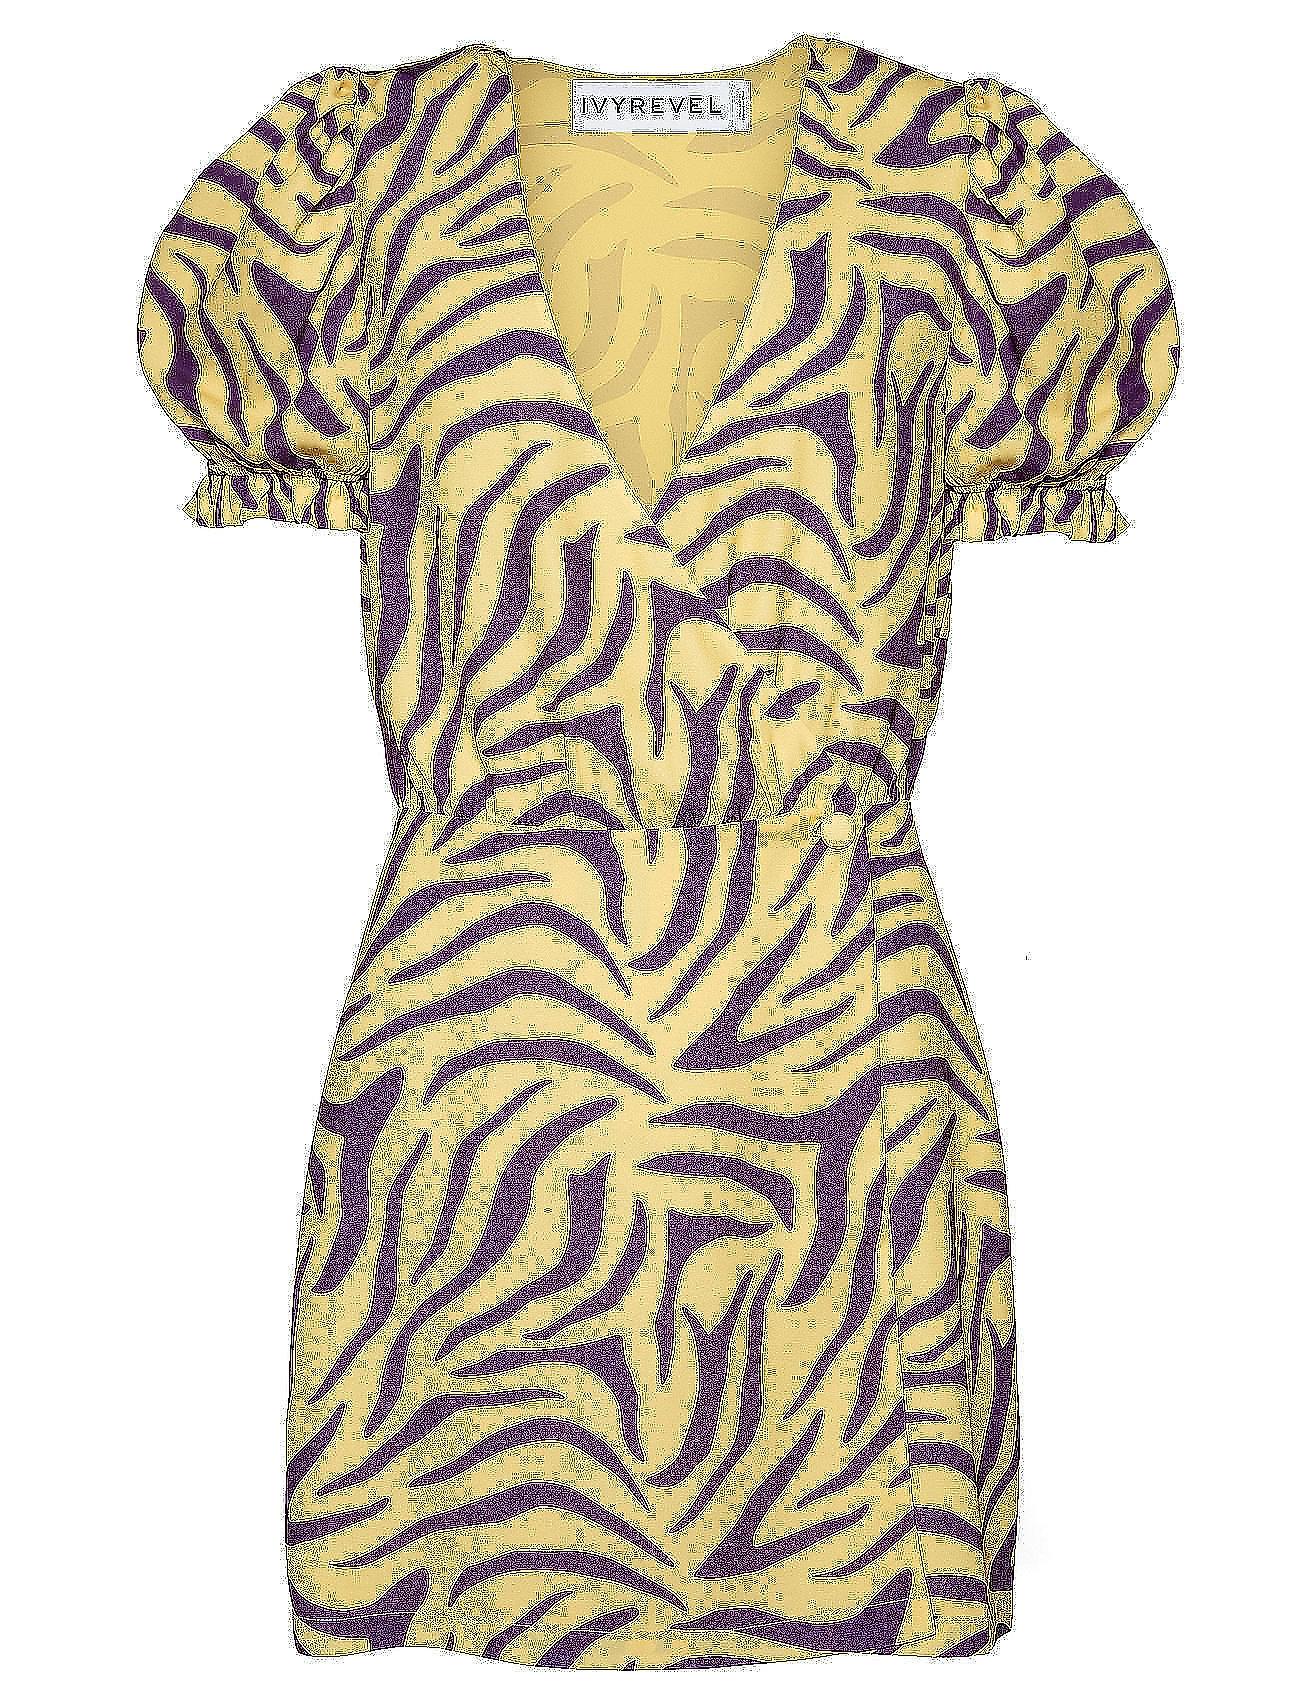 Overlap Dresspurple Sleeve Puff Puff yellowIvyrevel Sleeve thQdsrxCBo